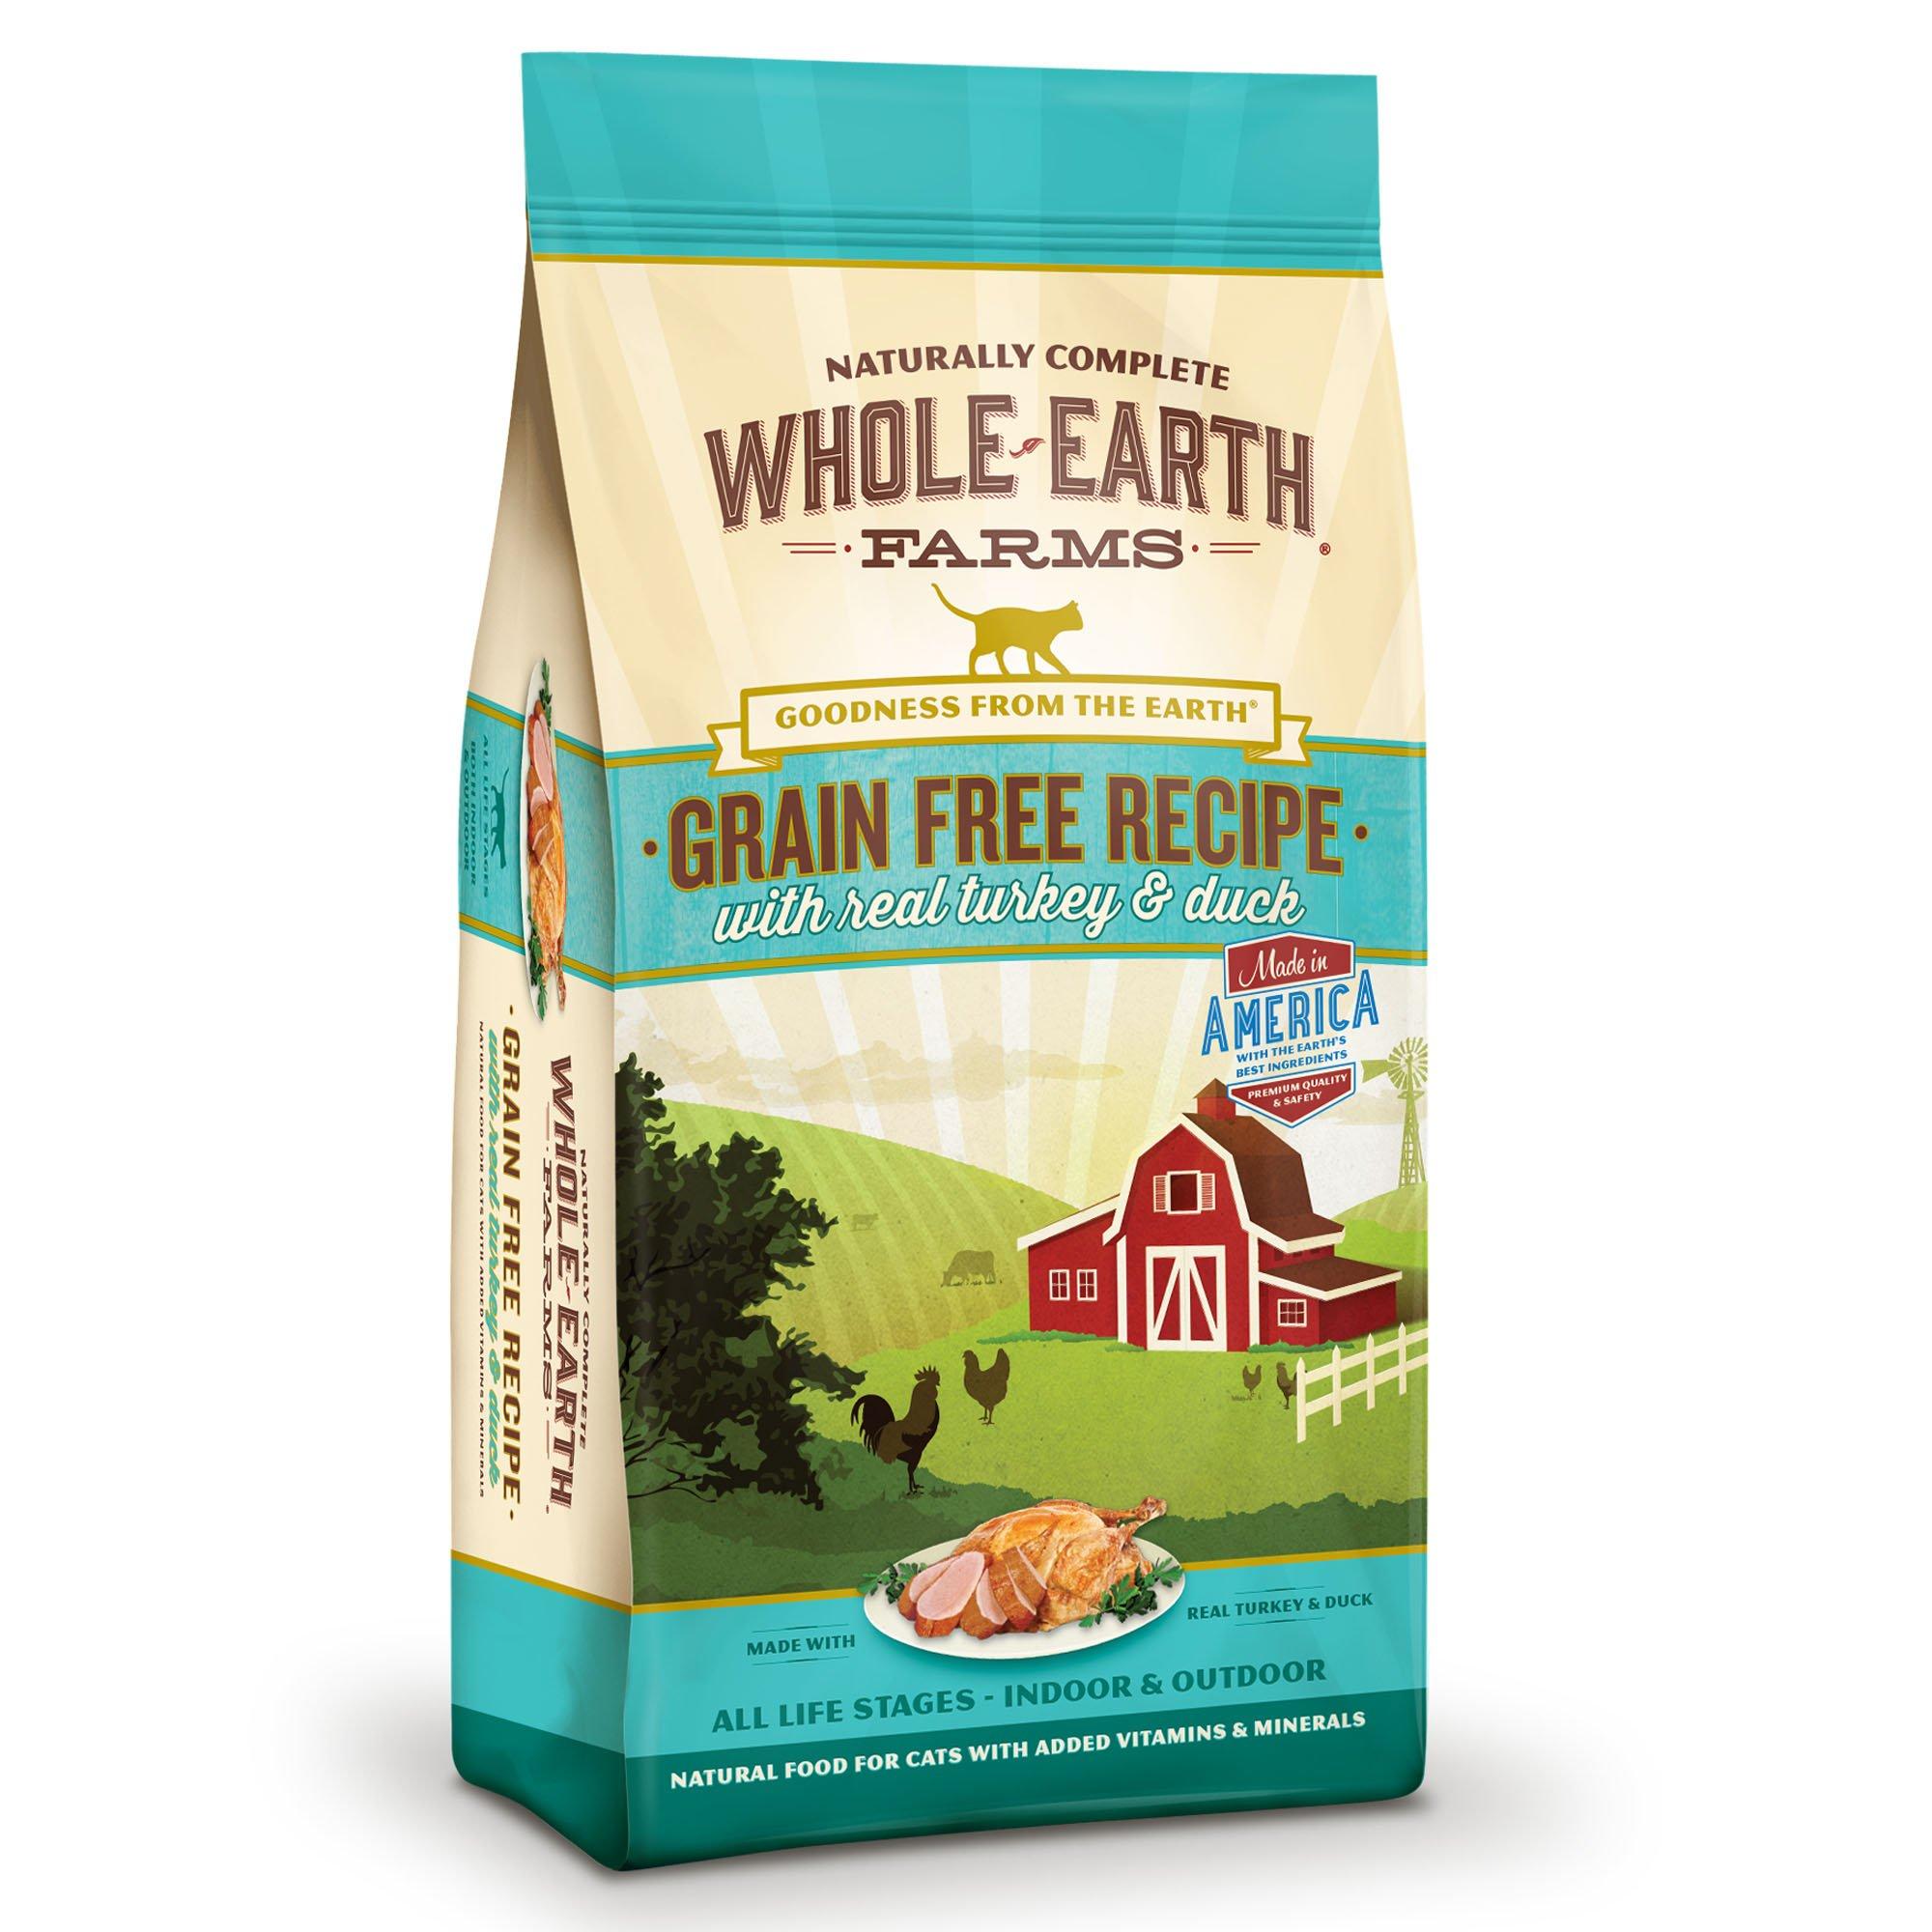 Whole-Earth-Farms-Grain-Free-Real-Turkey-amp-Duck-Cat-Food thumbnail 14